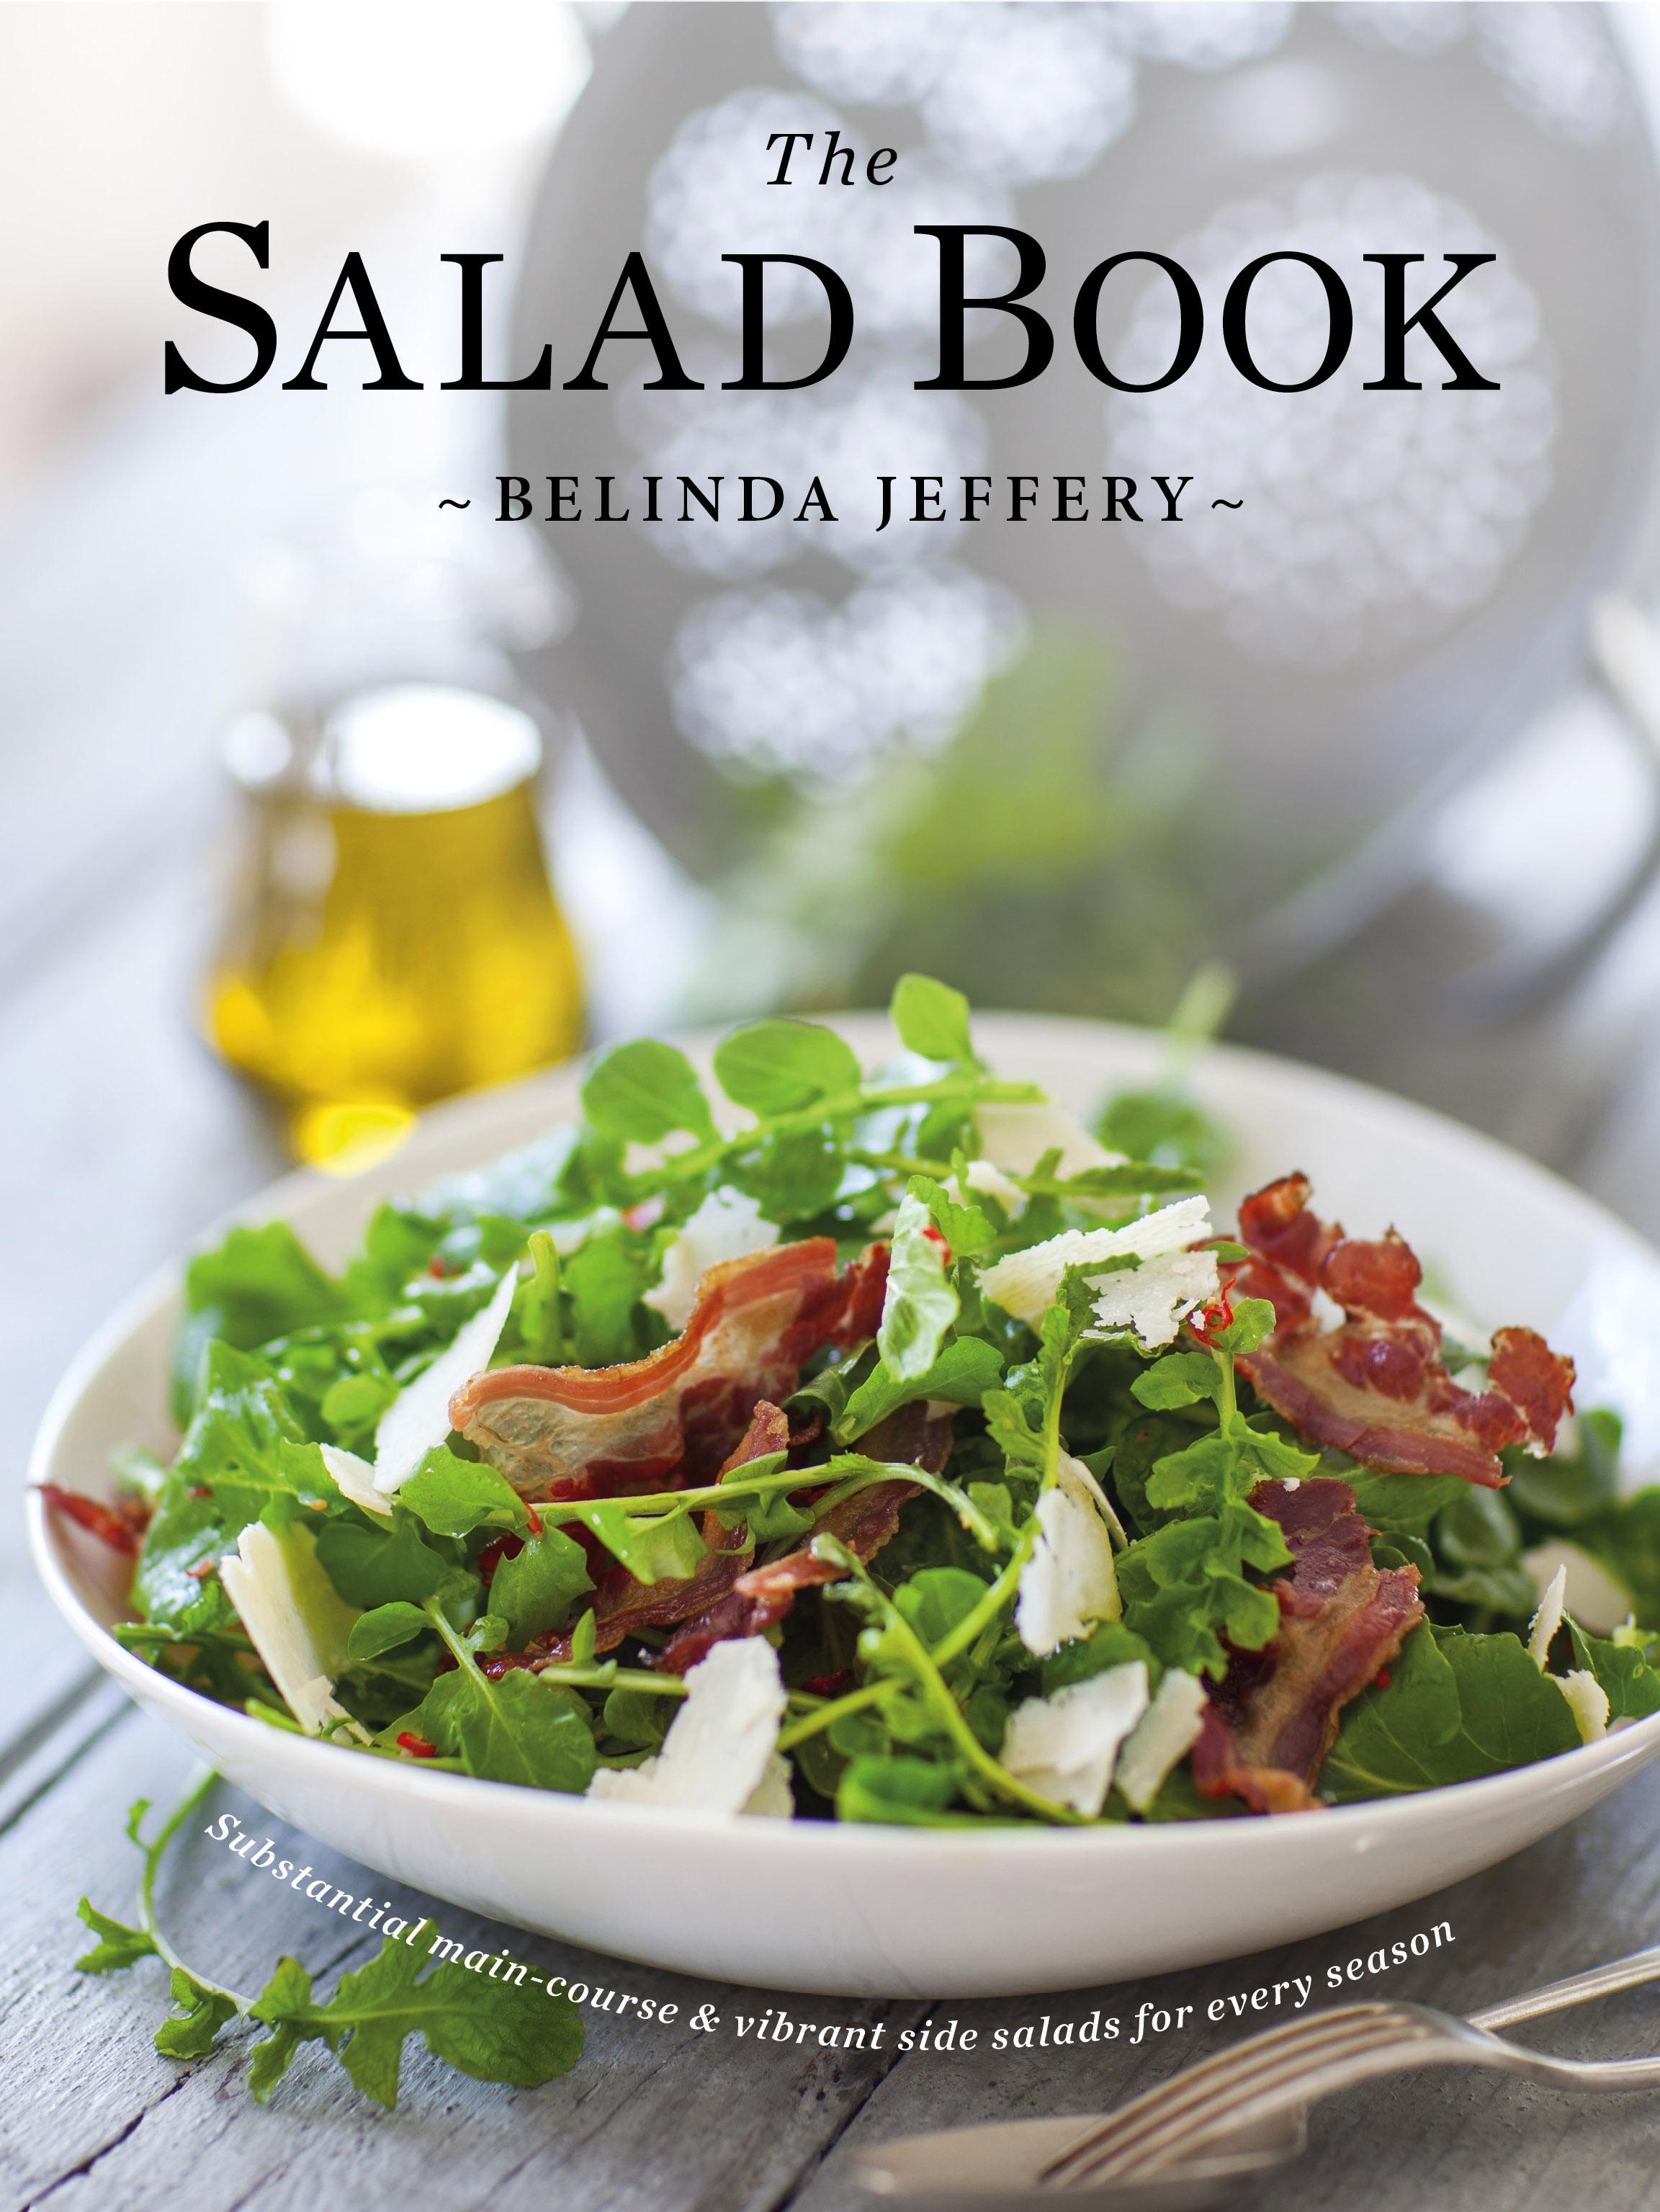 The Salad Book By Belinda Jeffery Penguin Books New Zealand